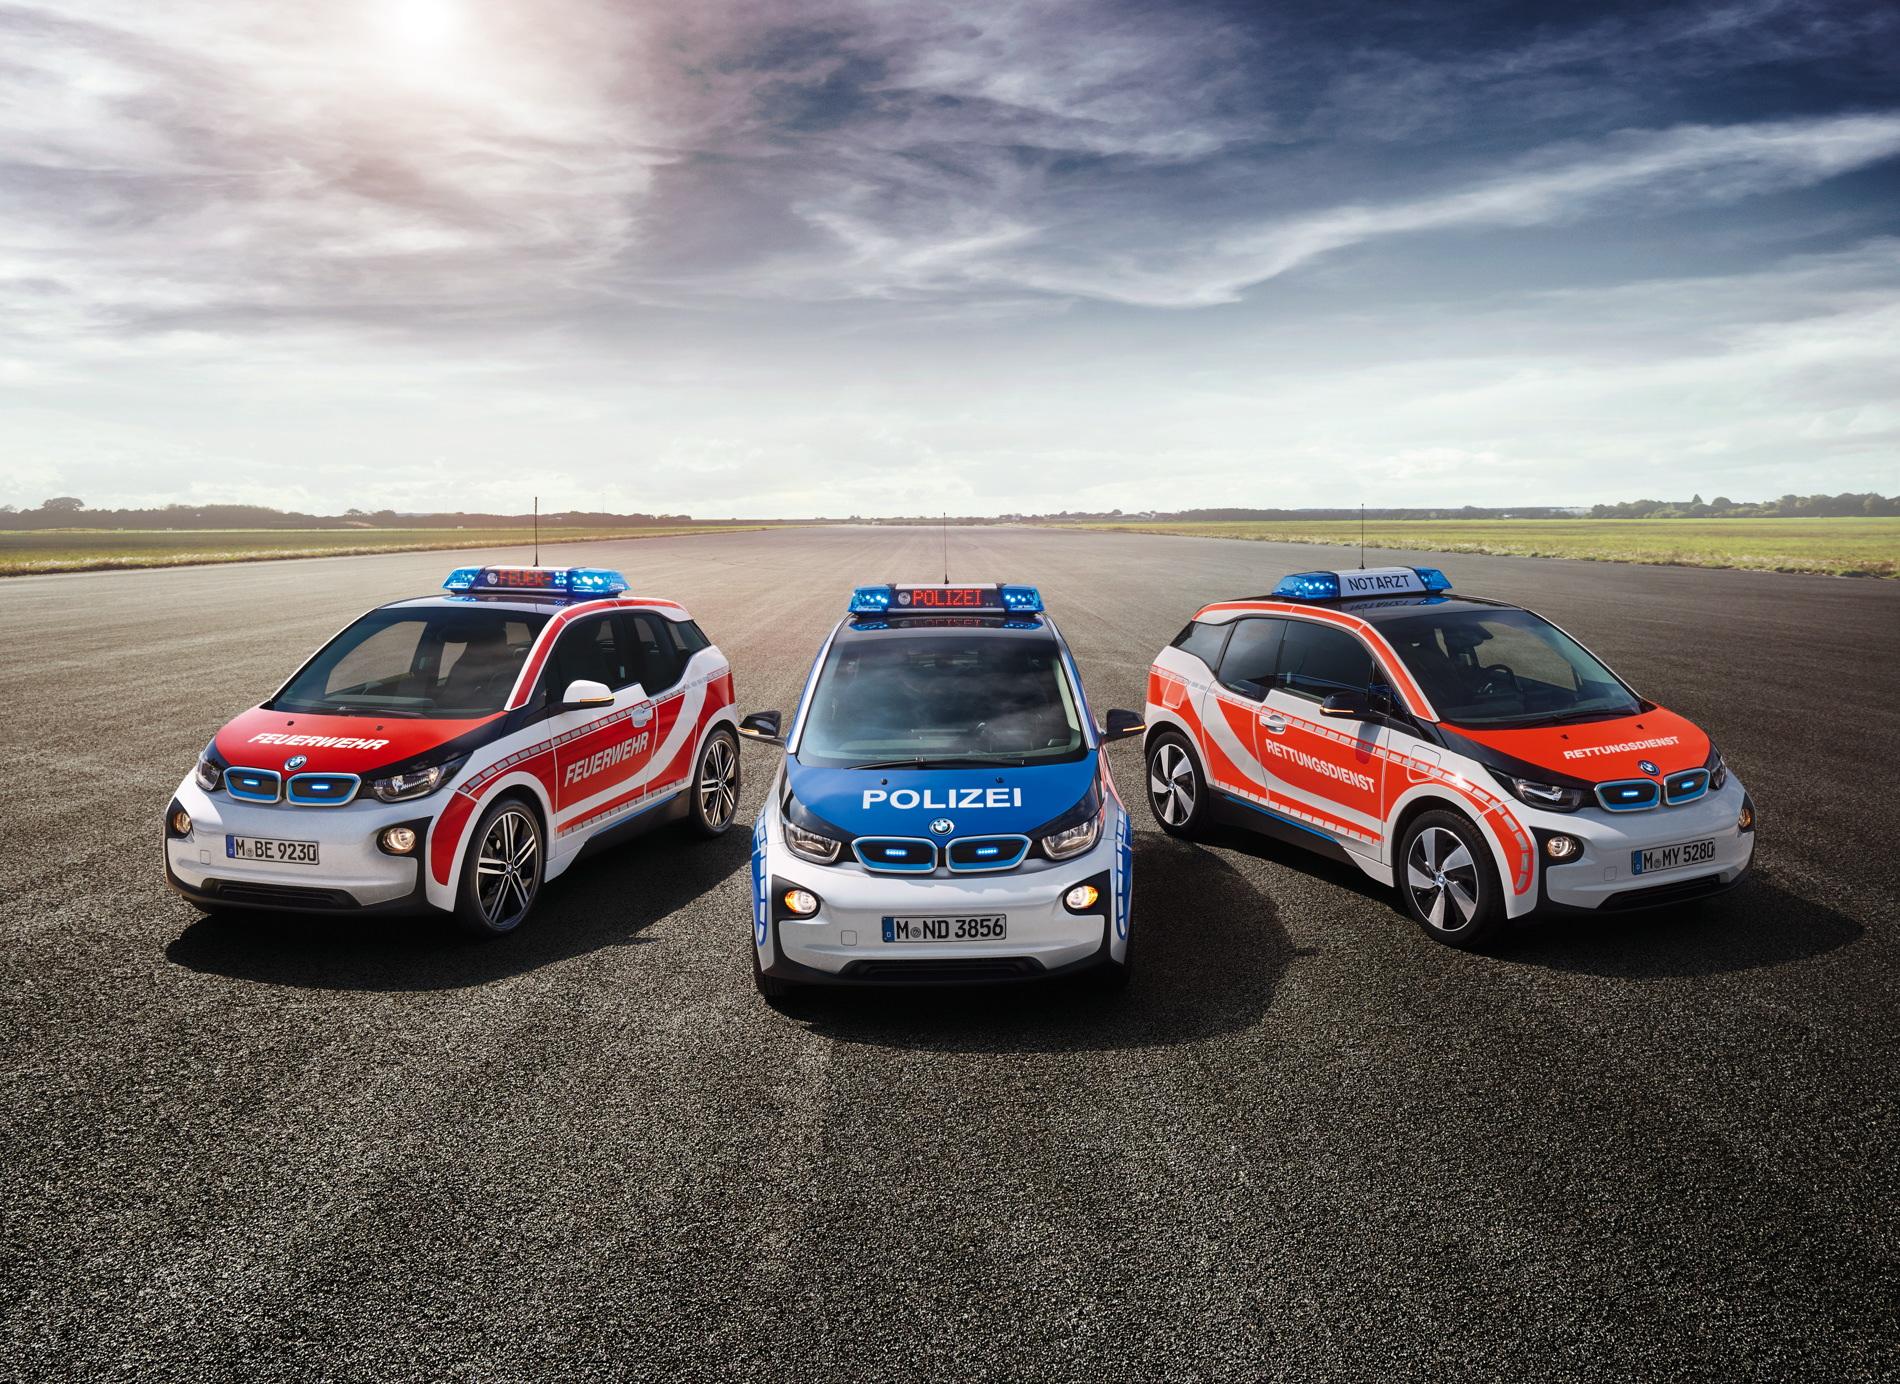 BMW i3 emergency vehicle 1